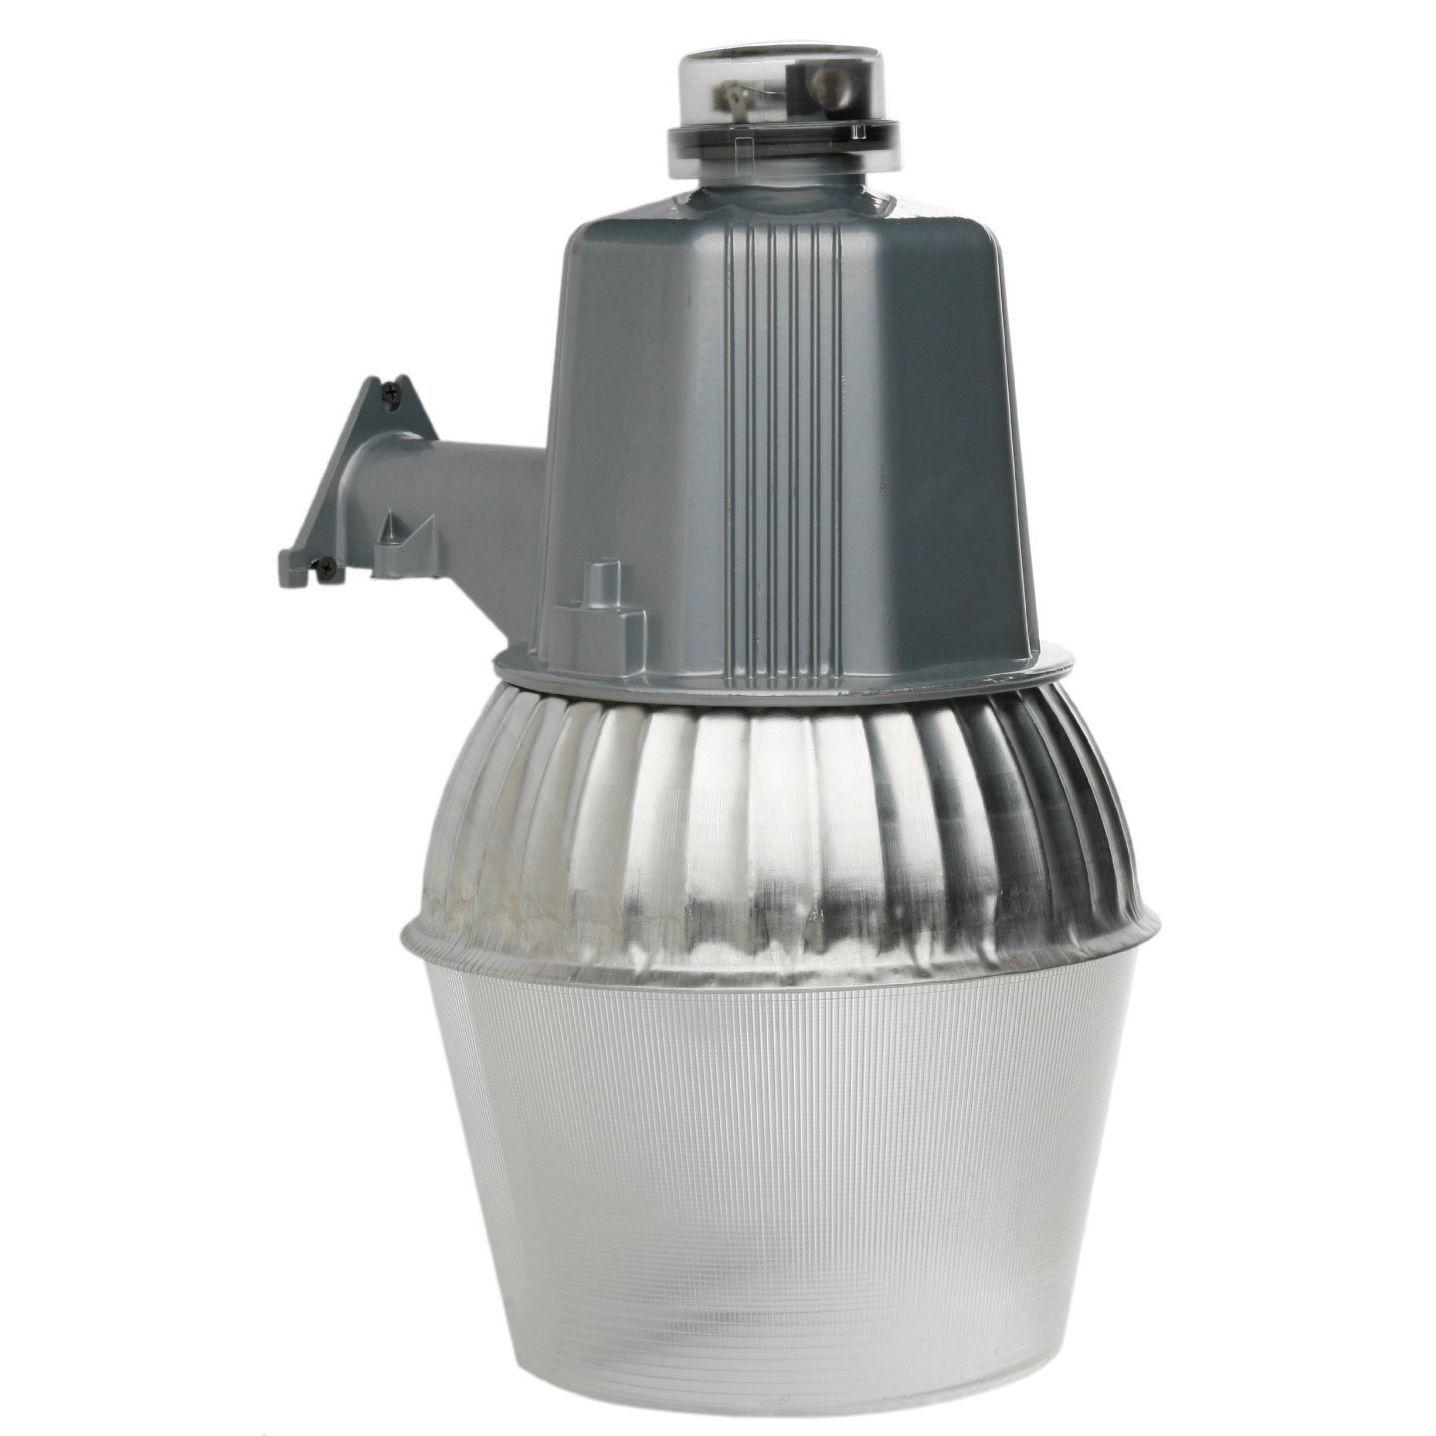 Designers Edge L1730 10 70 Watt High Pressure Sodium Dusk To Dawn Security Light Outdoor